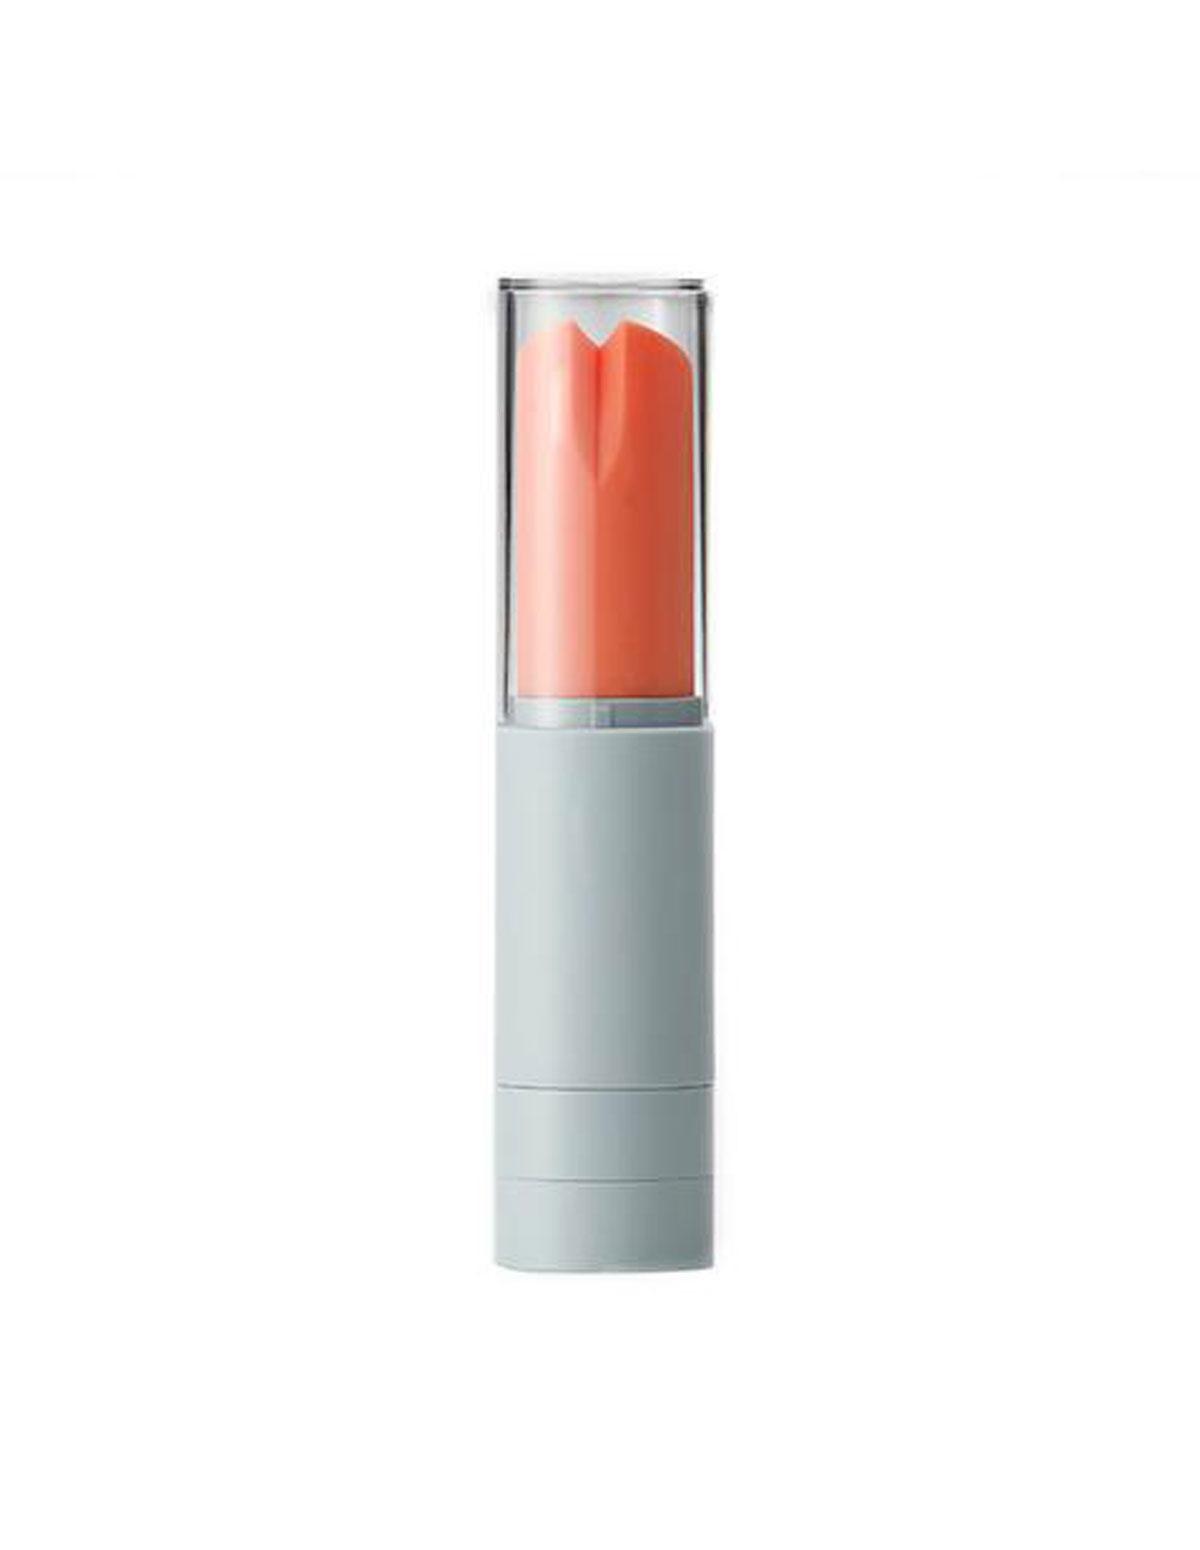 Iroha Stick Lipstick Vibrator